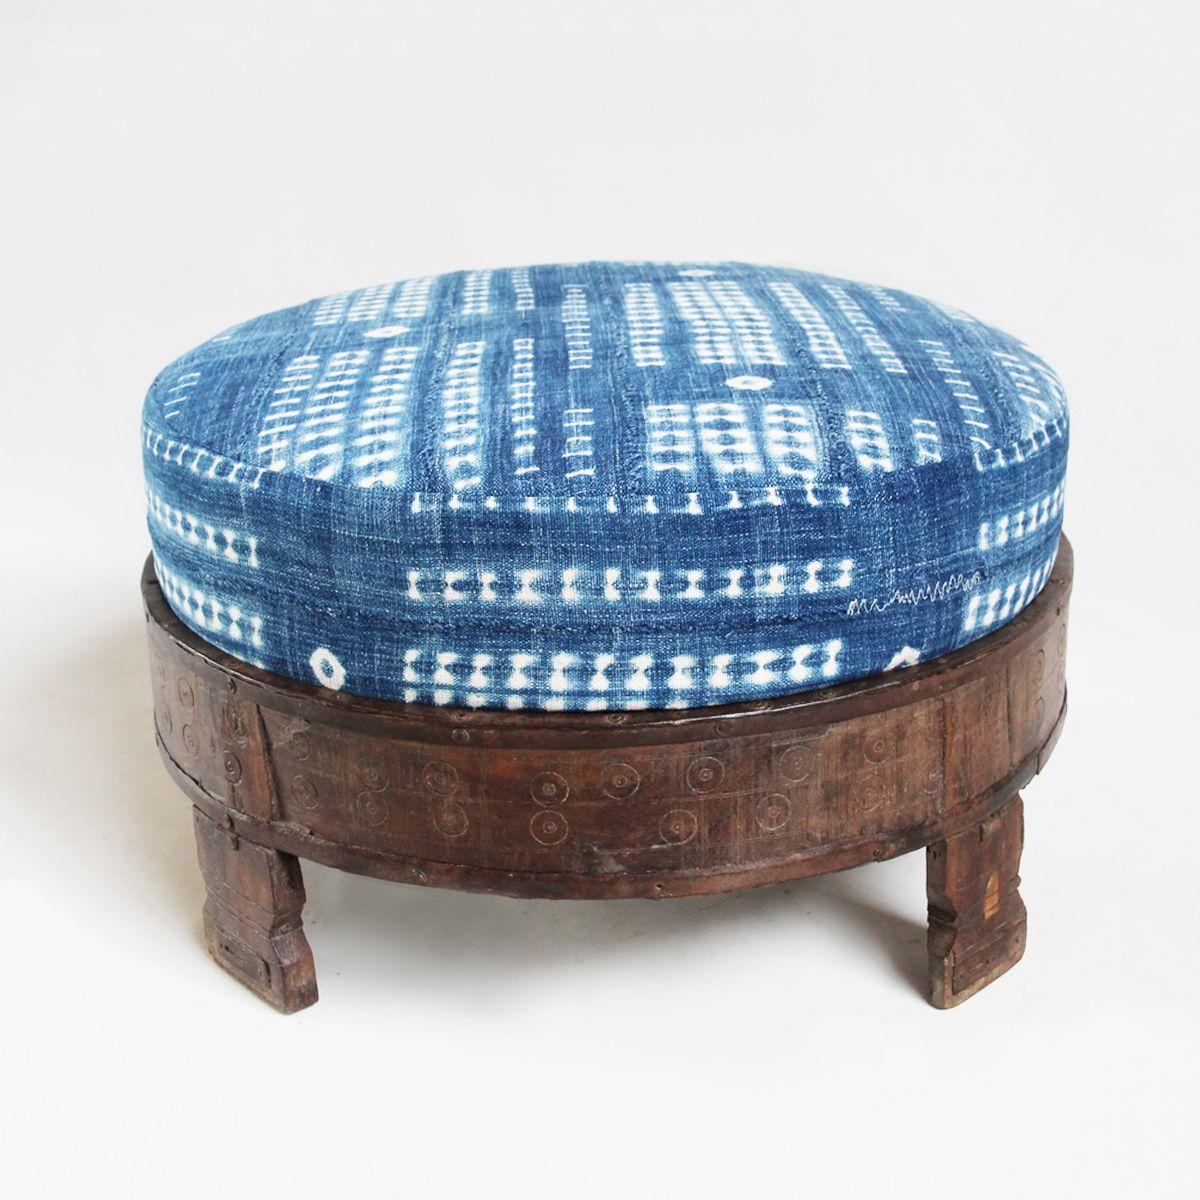 Original African indigo mud cloth ottoman cushion seated in a hand ...